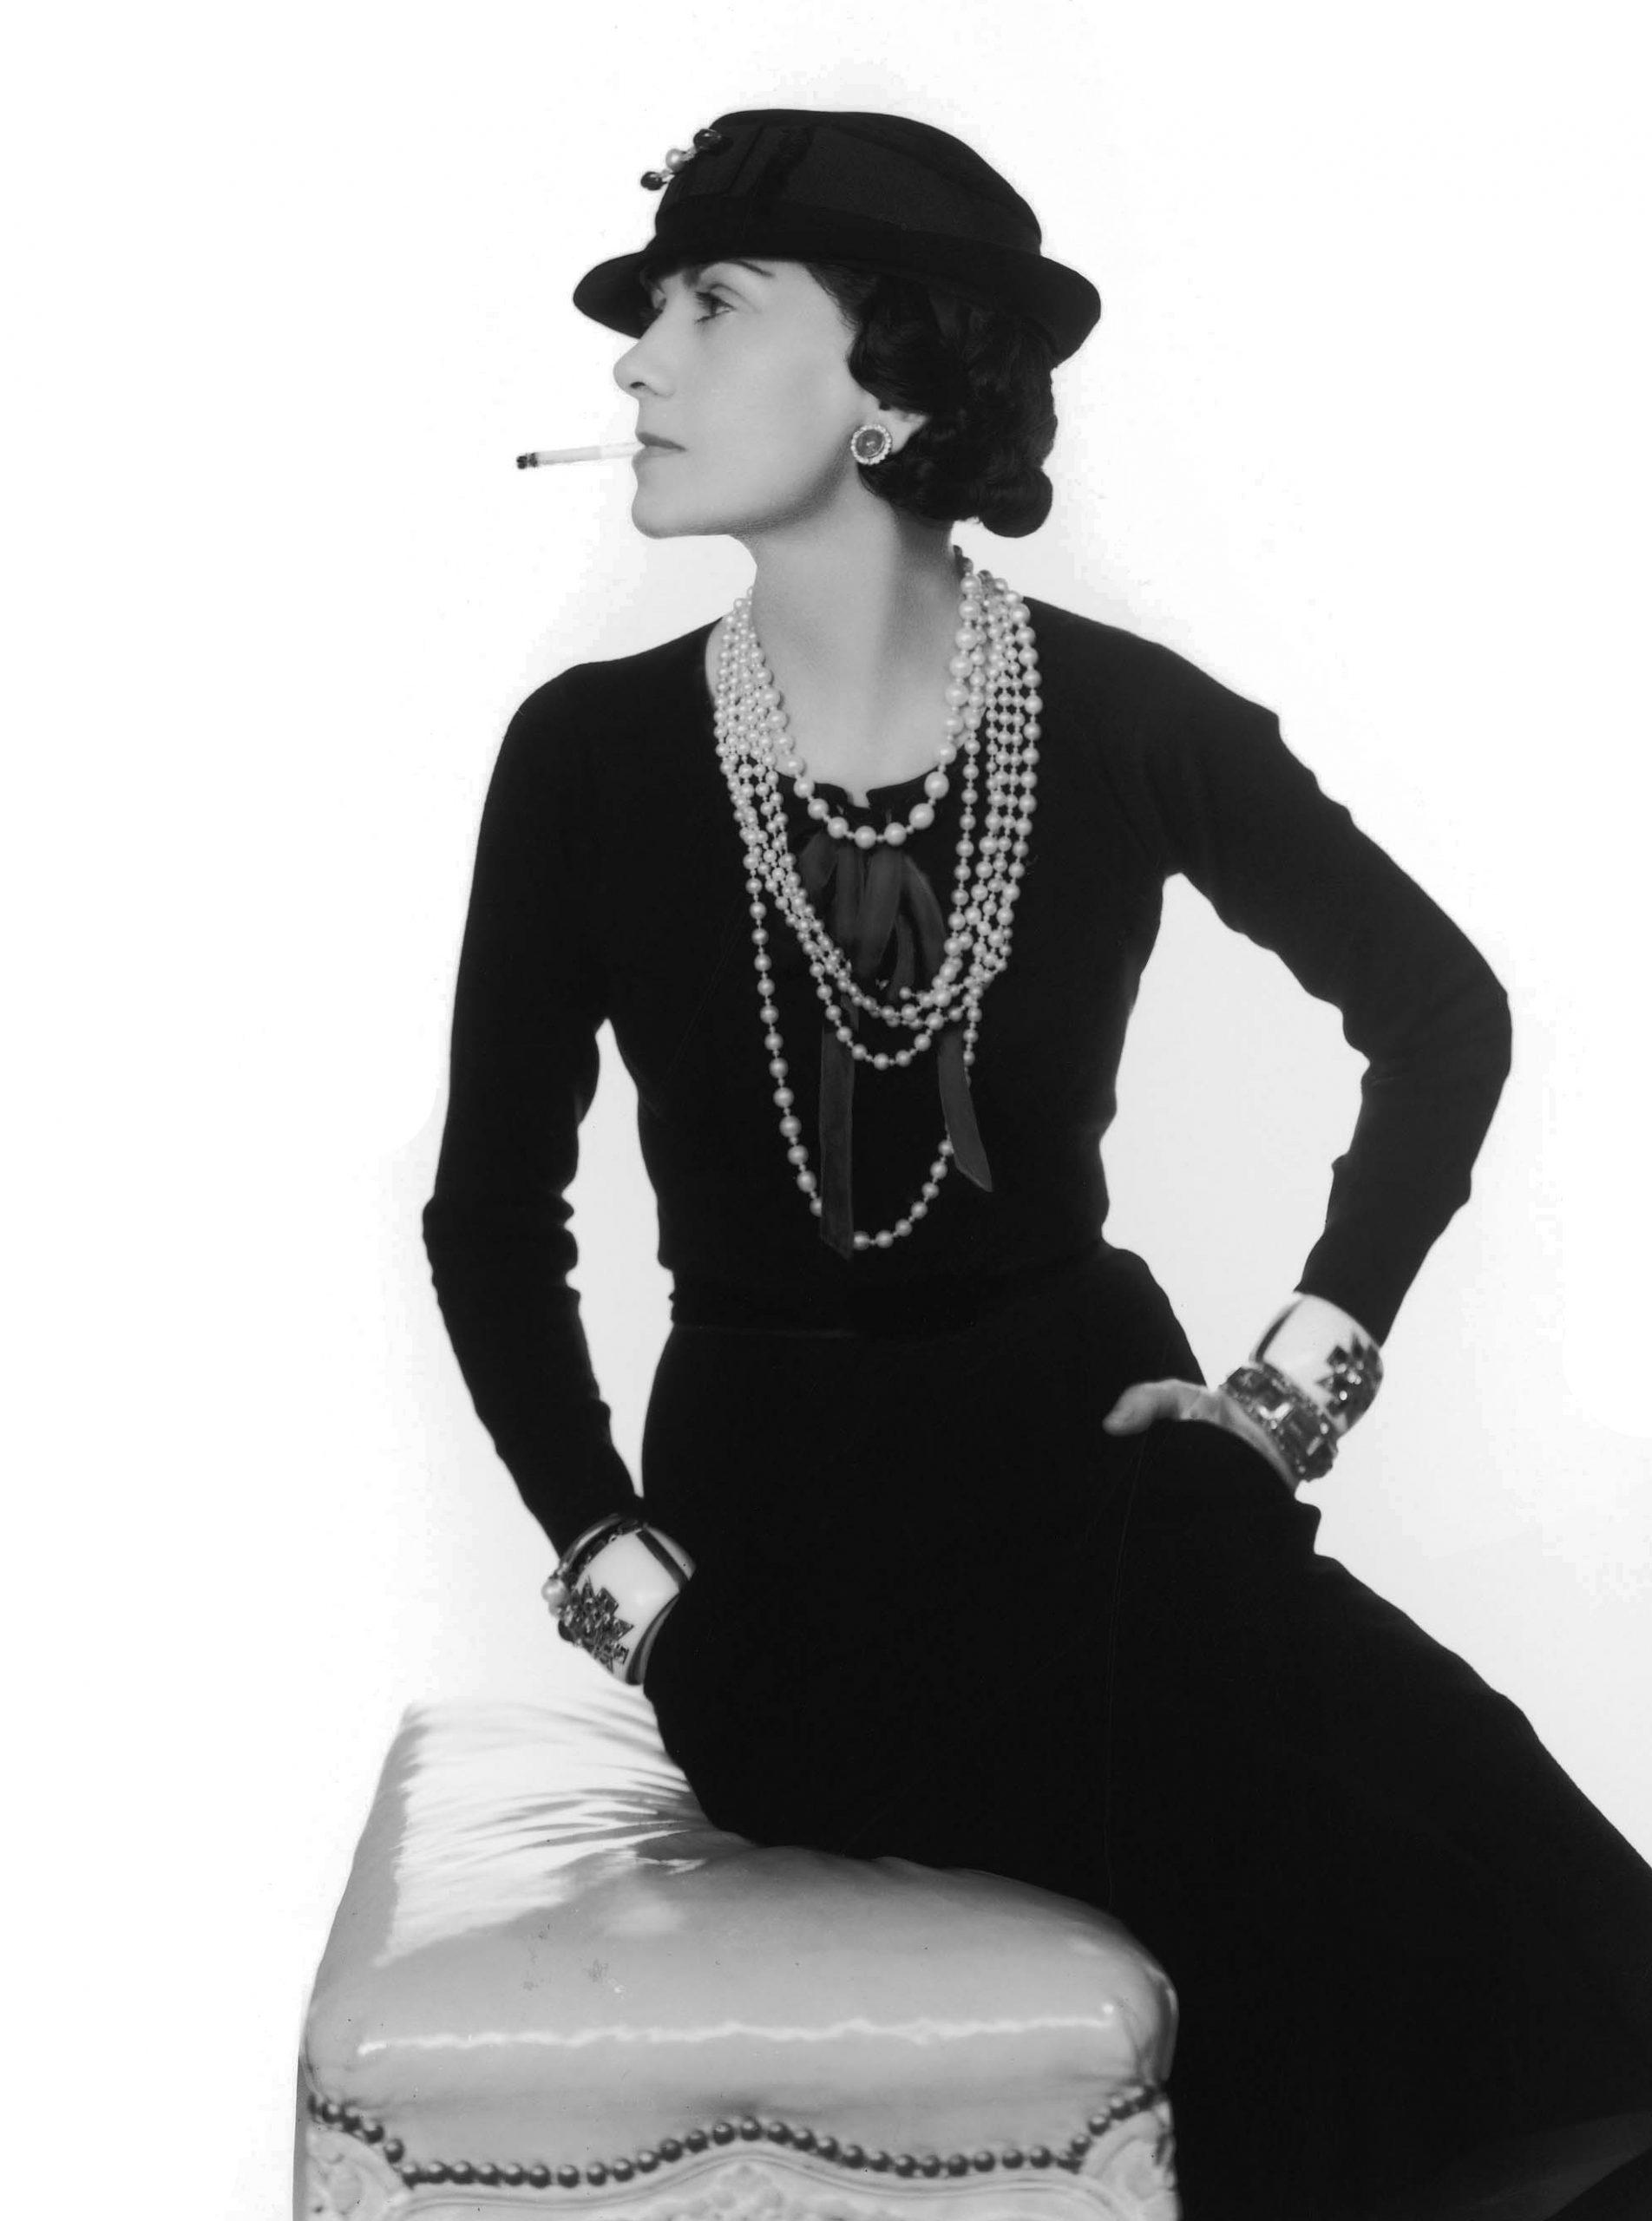 Costumi Carnevale Moda 2015 Martedì Grasso Coco Chanel Karl Lagerfeld Twiggy Marilyn Monroe Audrey Hepburn Abiti